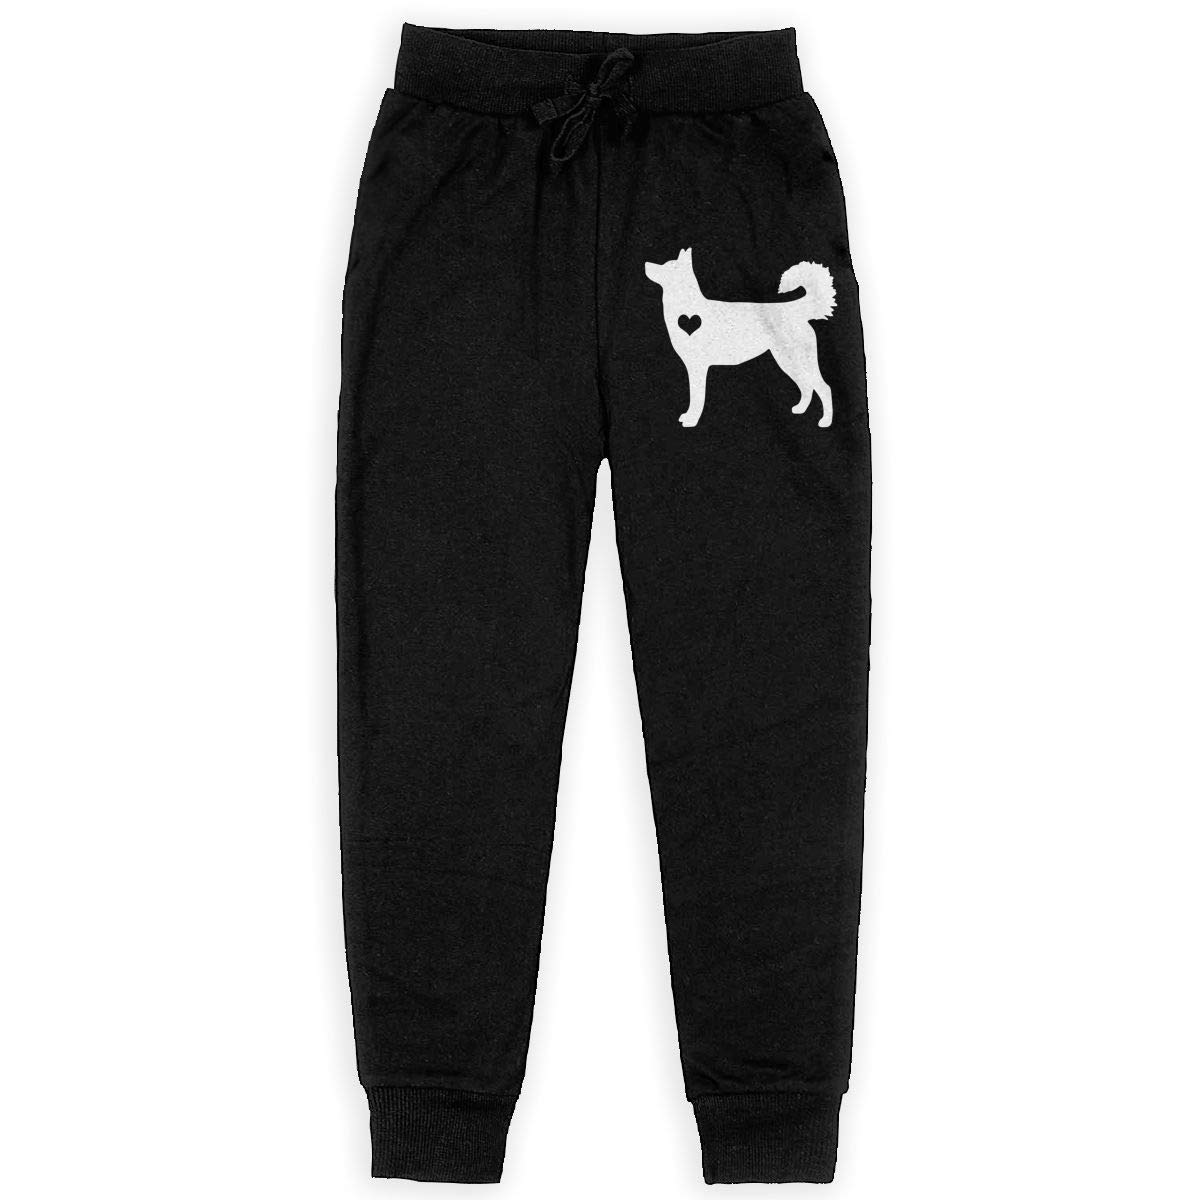 Husky Heart Soft//Cozy Sweatpants Girls Active Basic Jogger Fleece Pants for Teen Boy